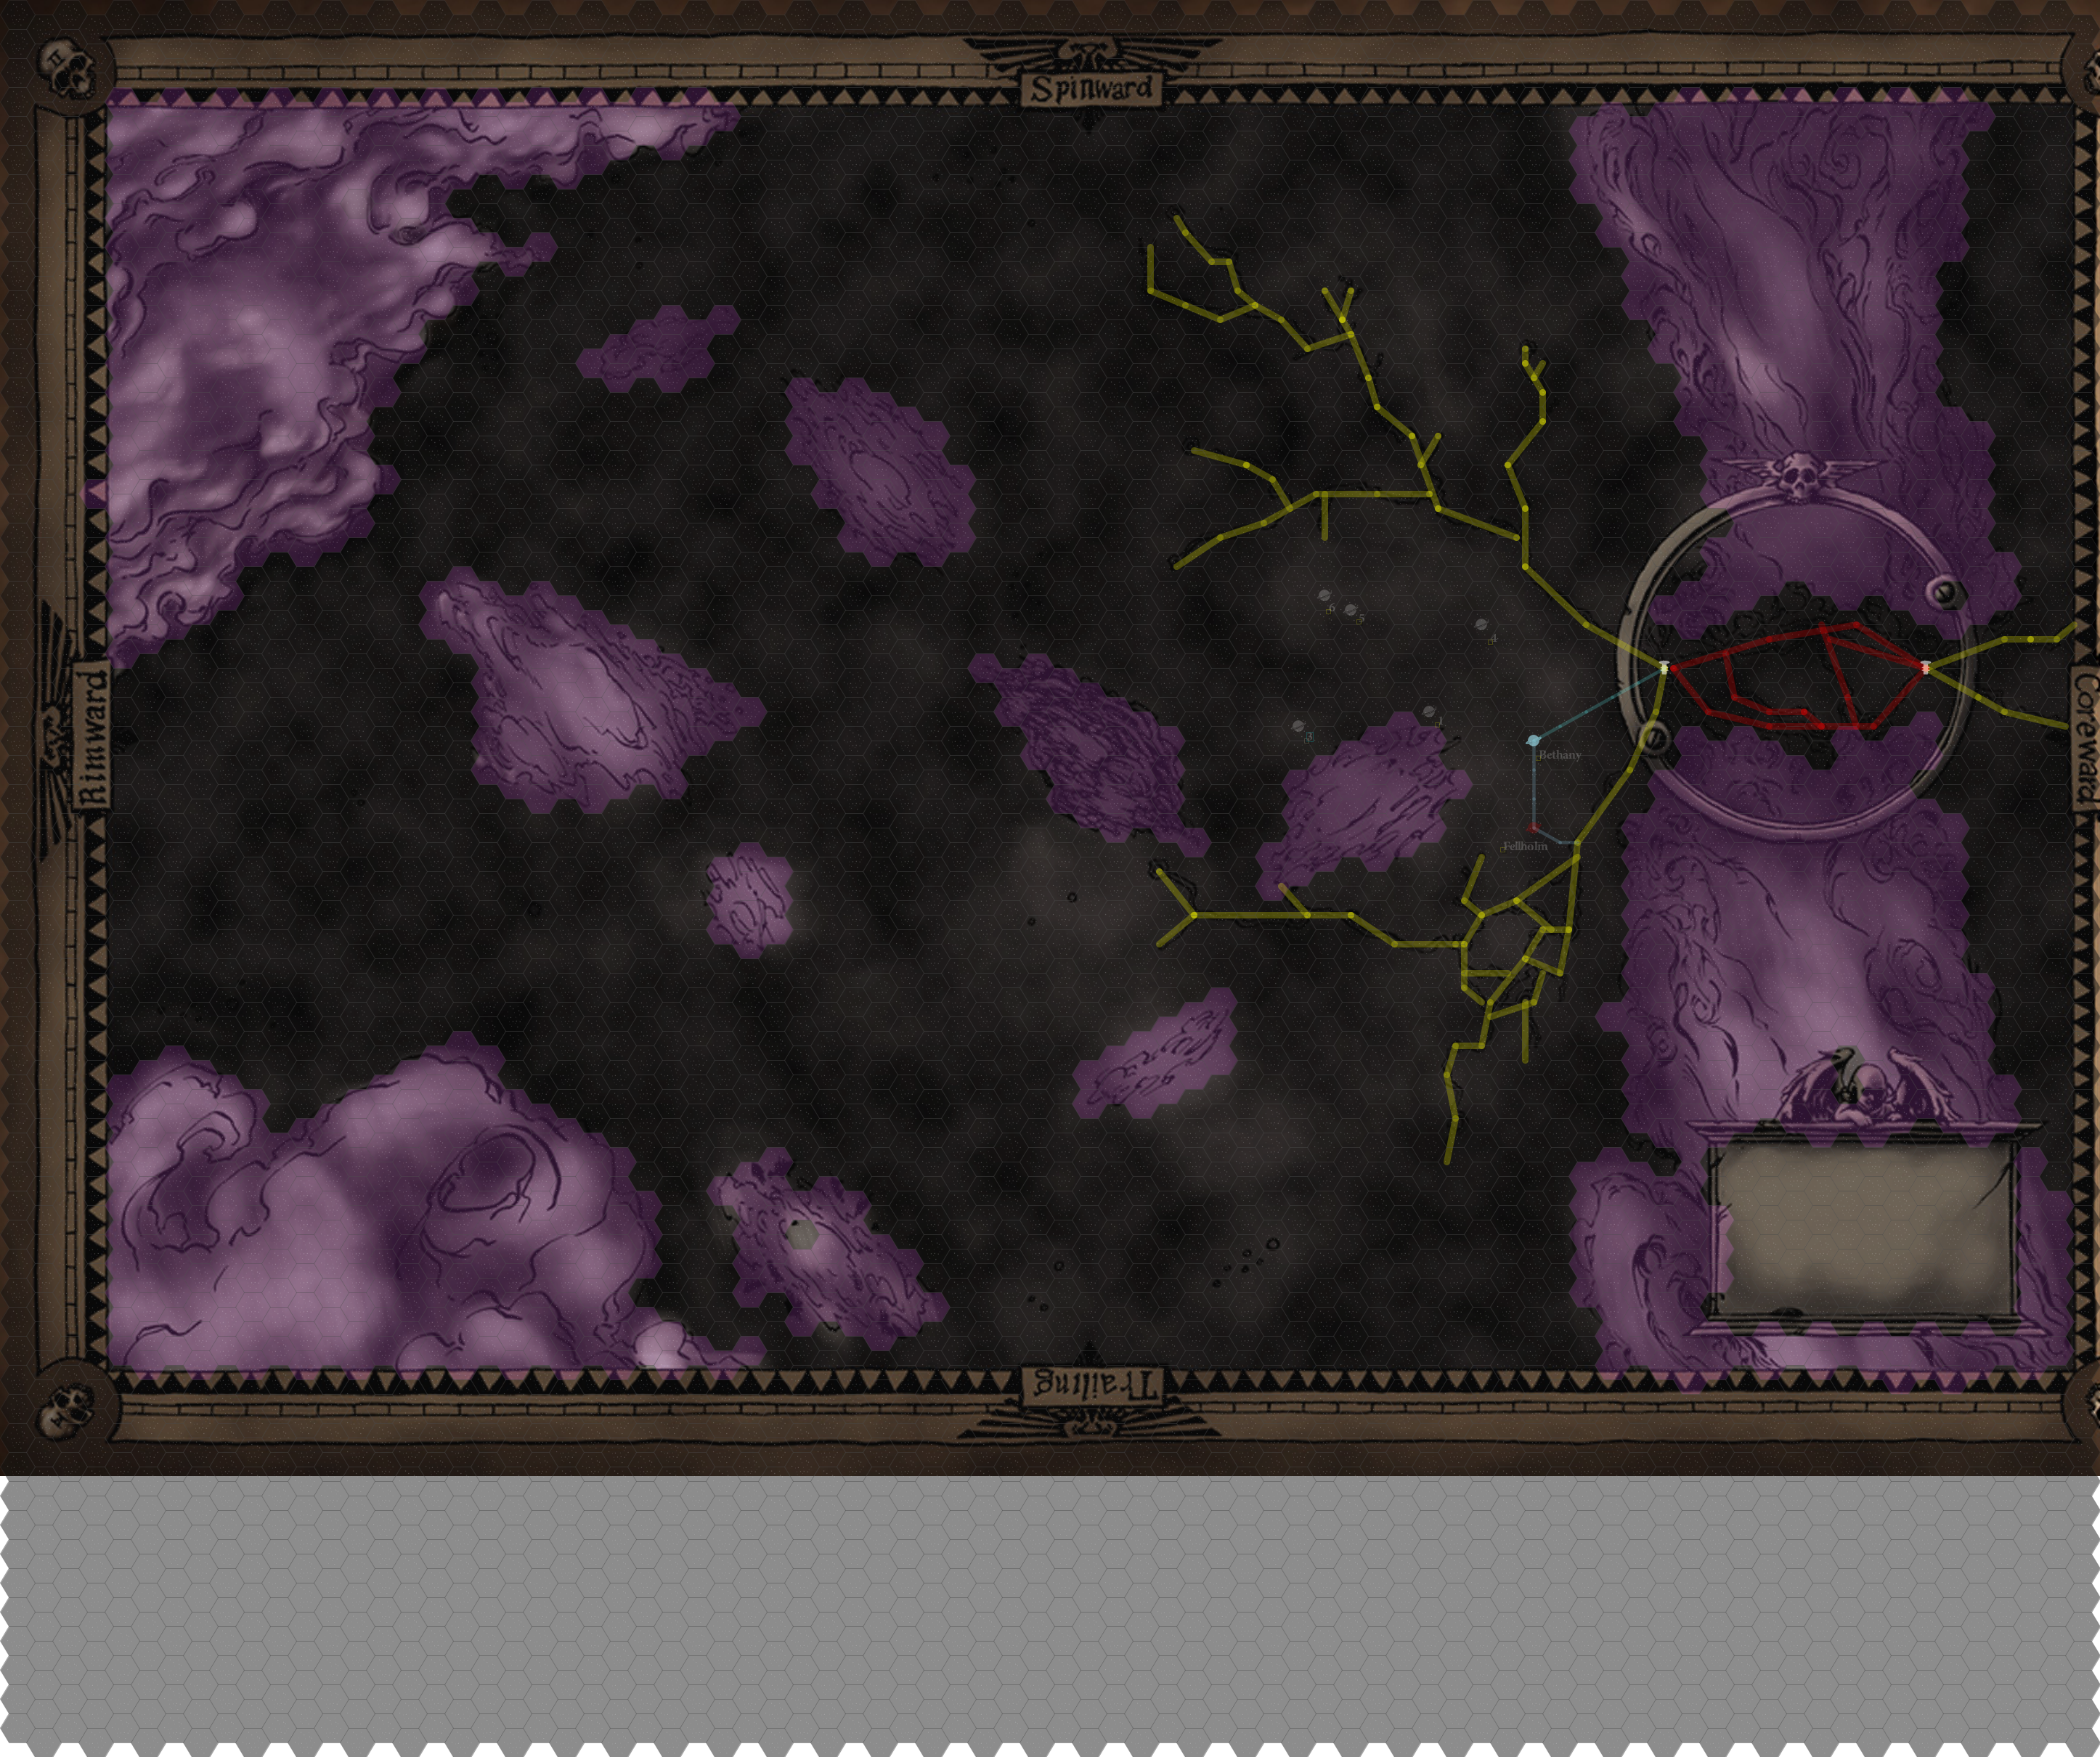 Liry - Dark Trader Koronus Expanse Map on